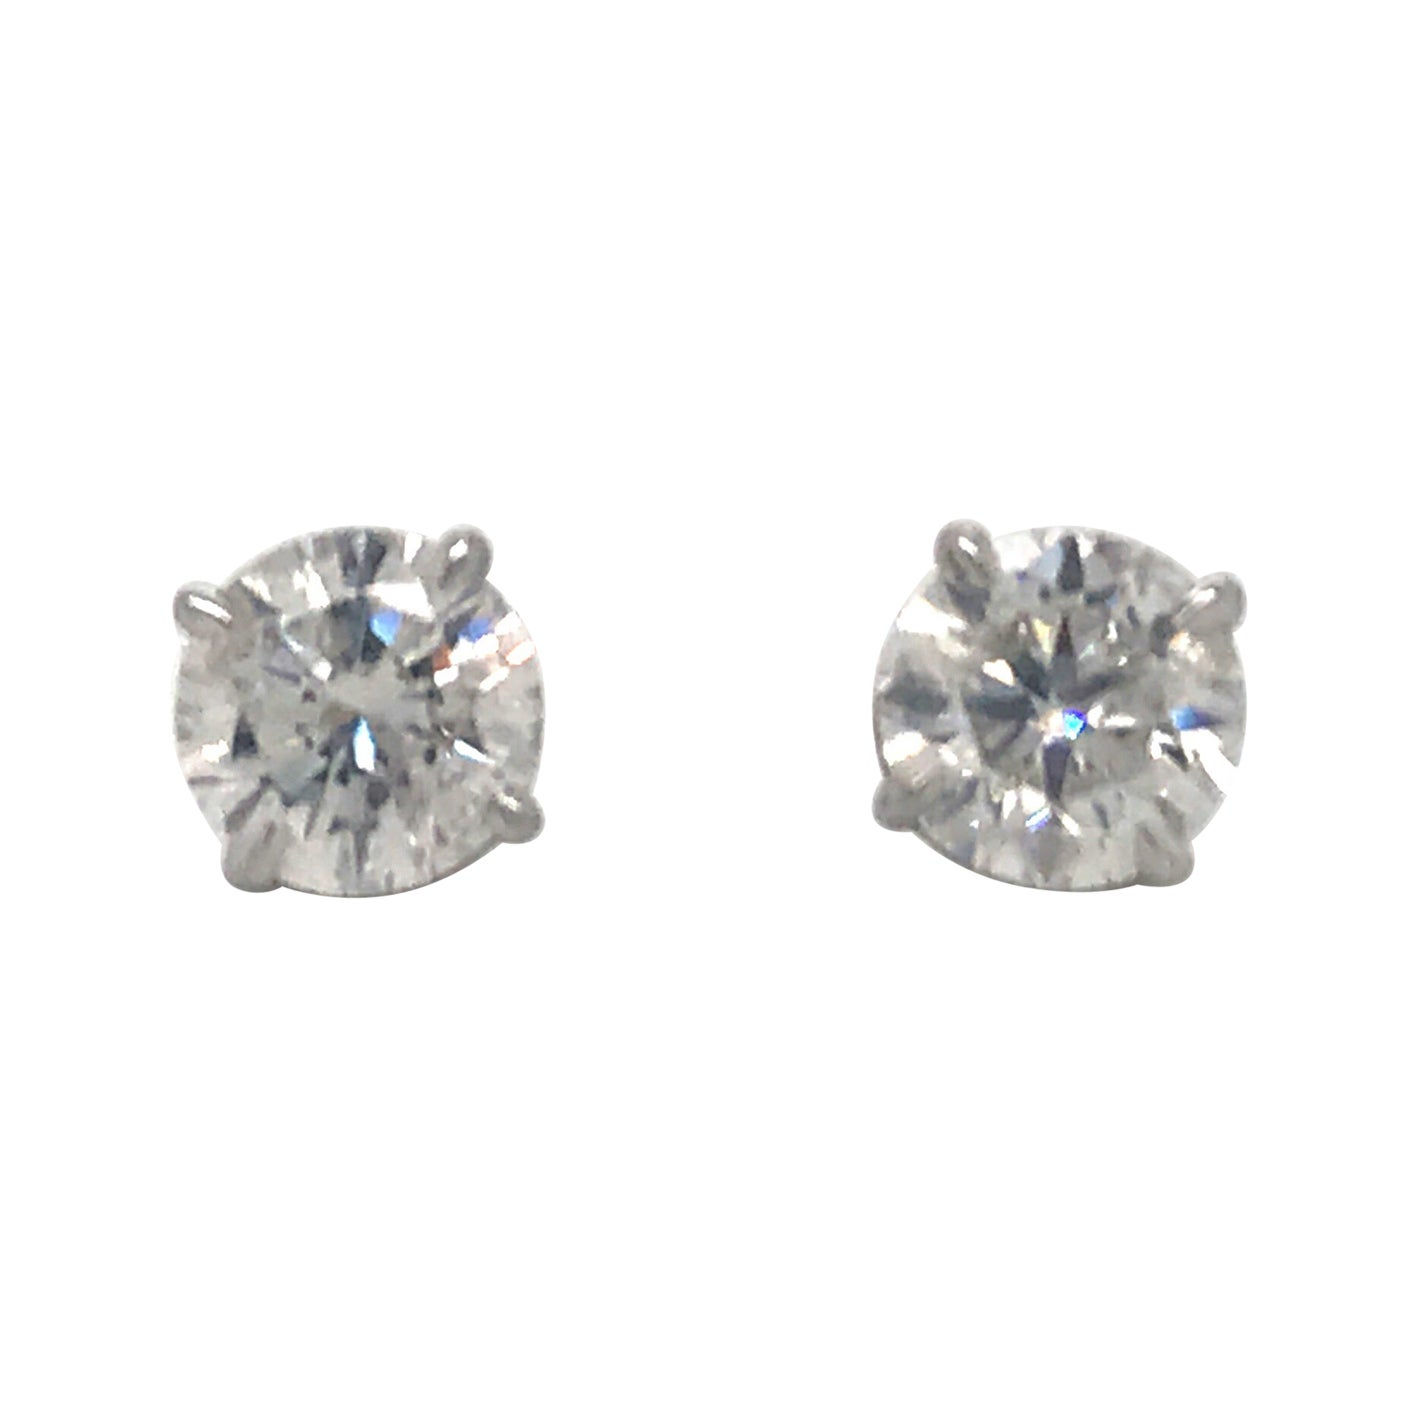 Diamond Stud Earrings 3.01 Carat H-I I1 14 Karat White Gold